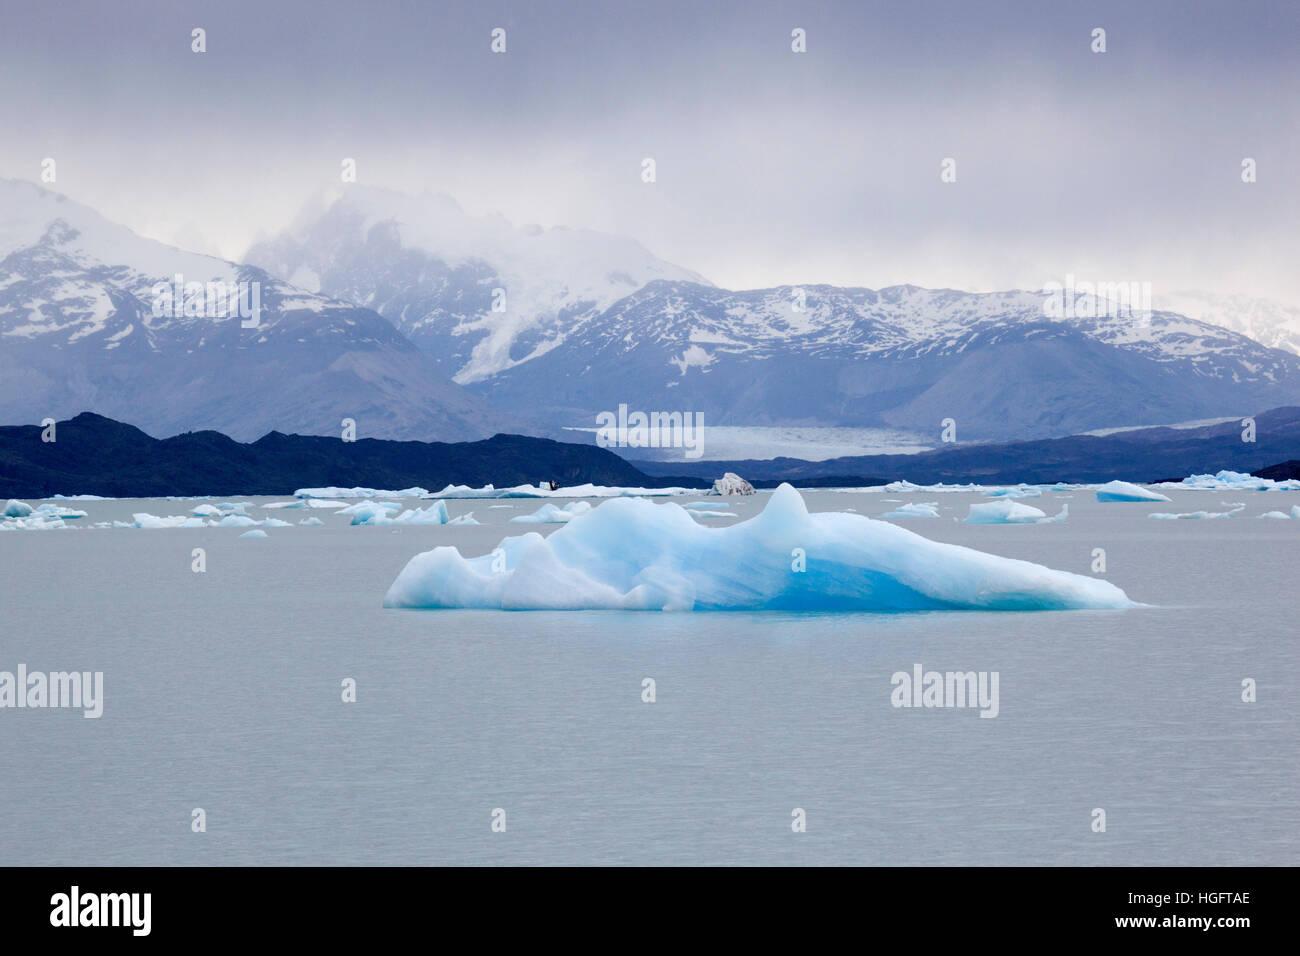 Icebergs on Lago Argentino, El Calafate, Parque Nacional Los Glaciares, Patagonia, Argentina, South America - Stock Image